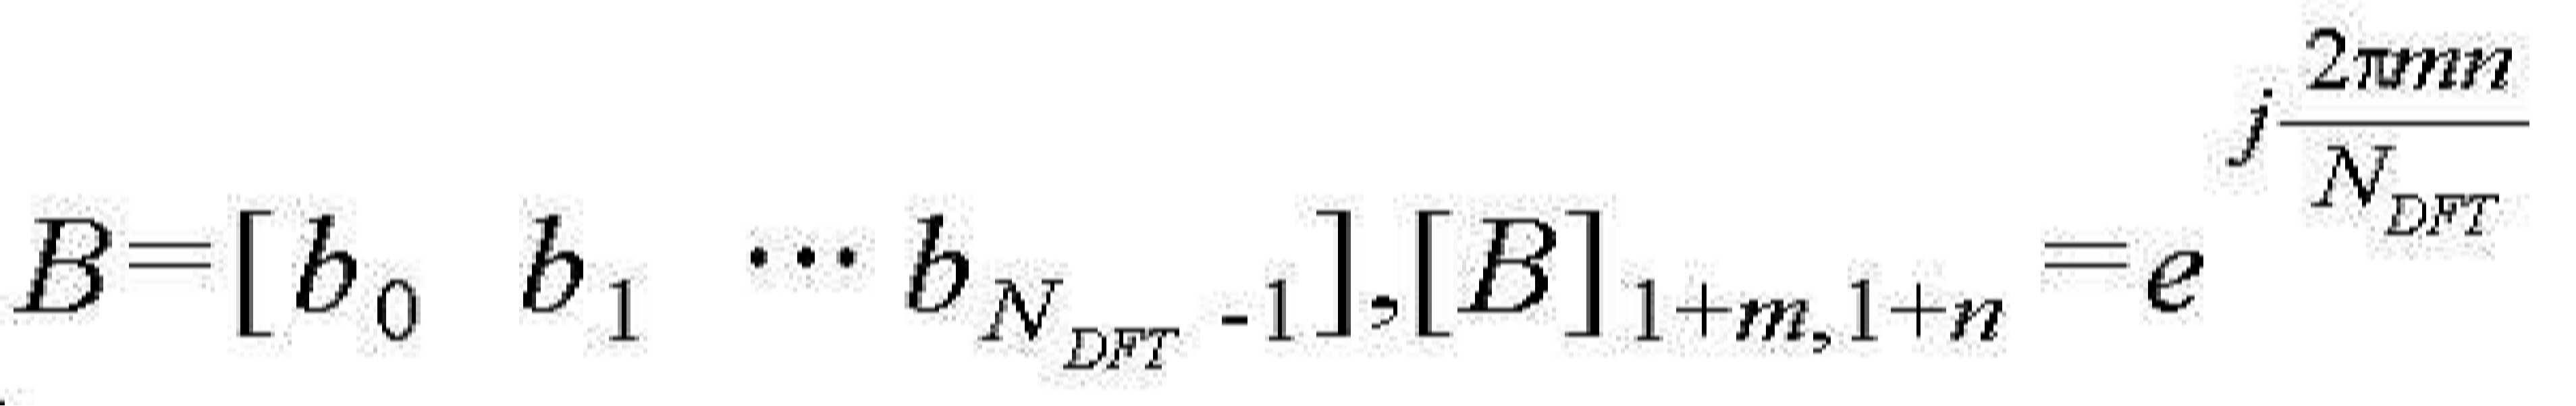 Figure 112019051199313-pct00070